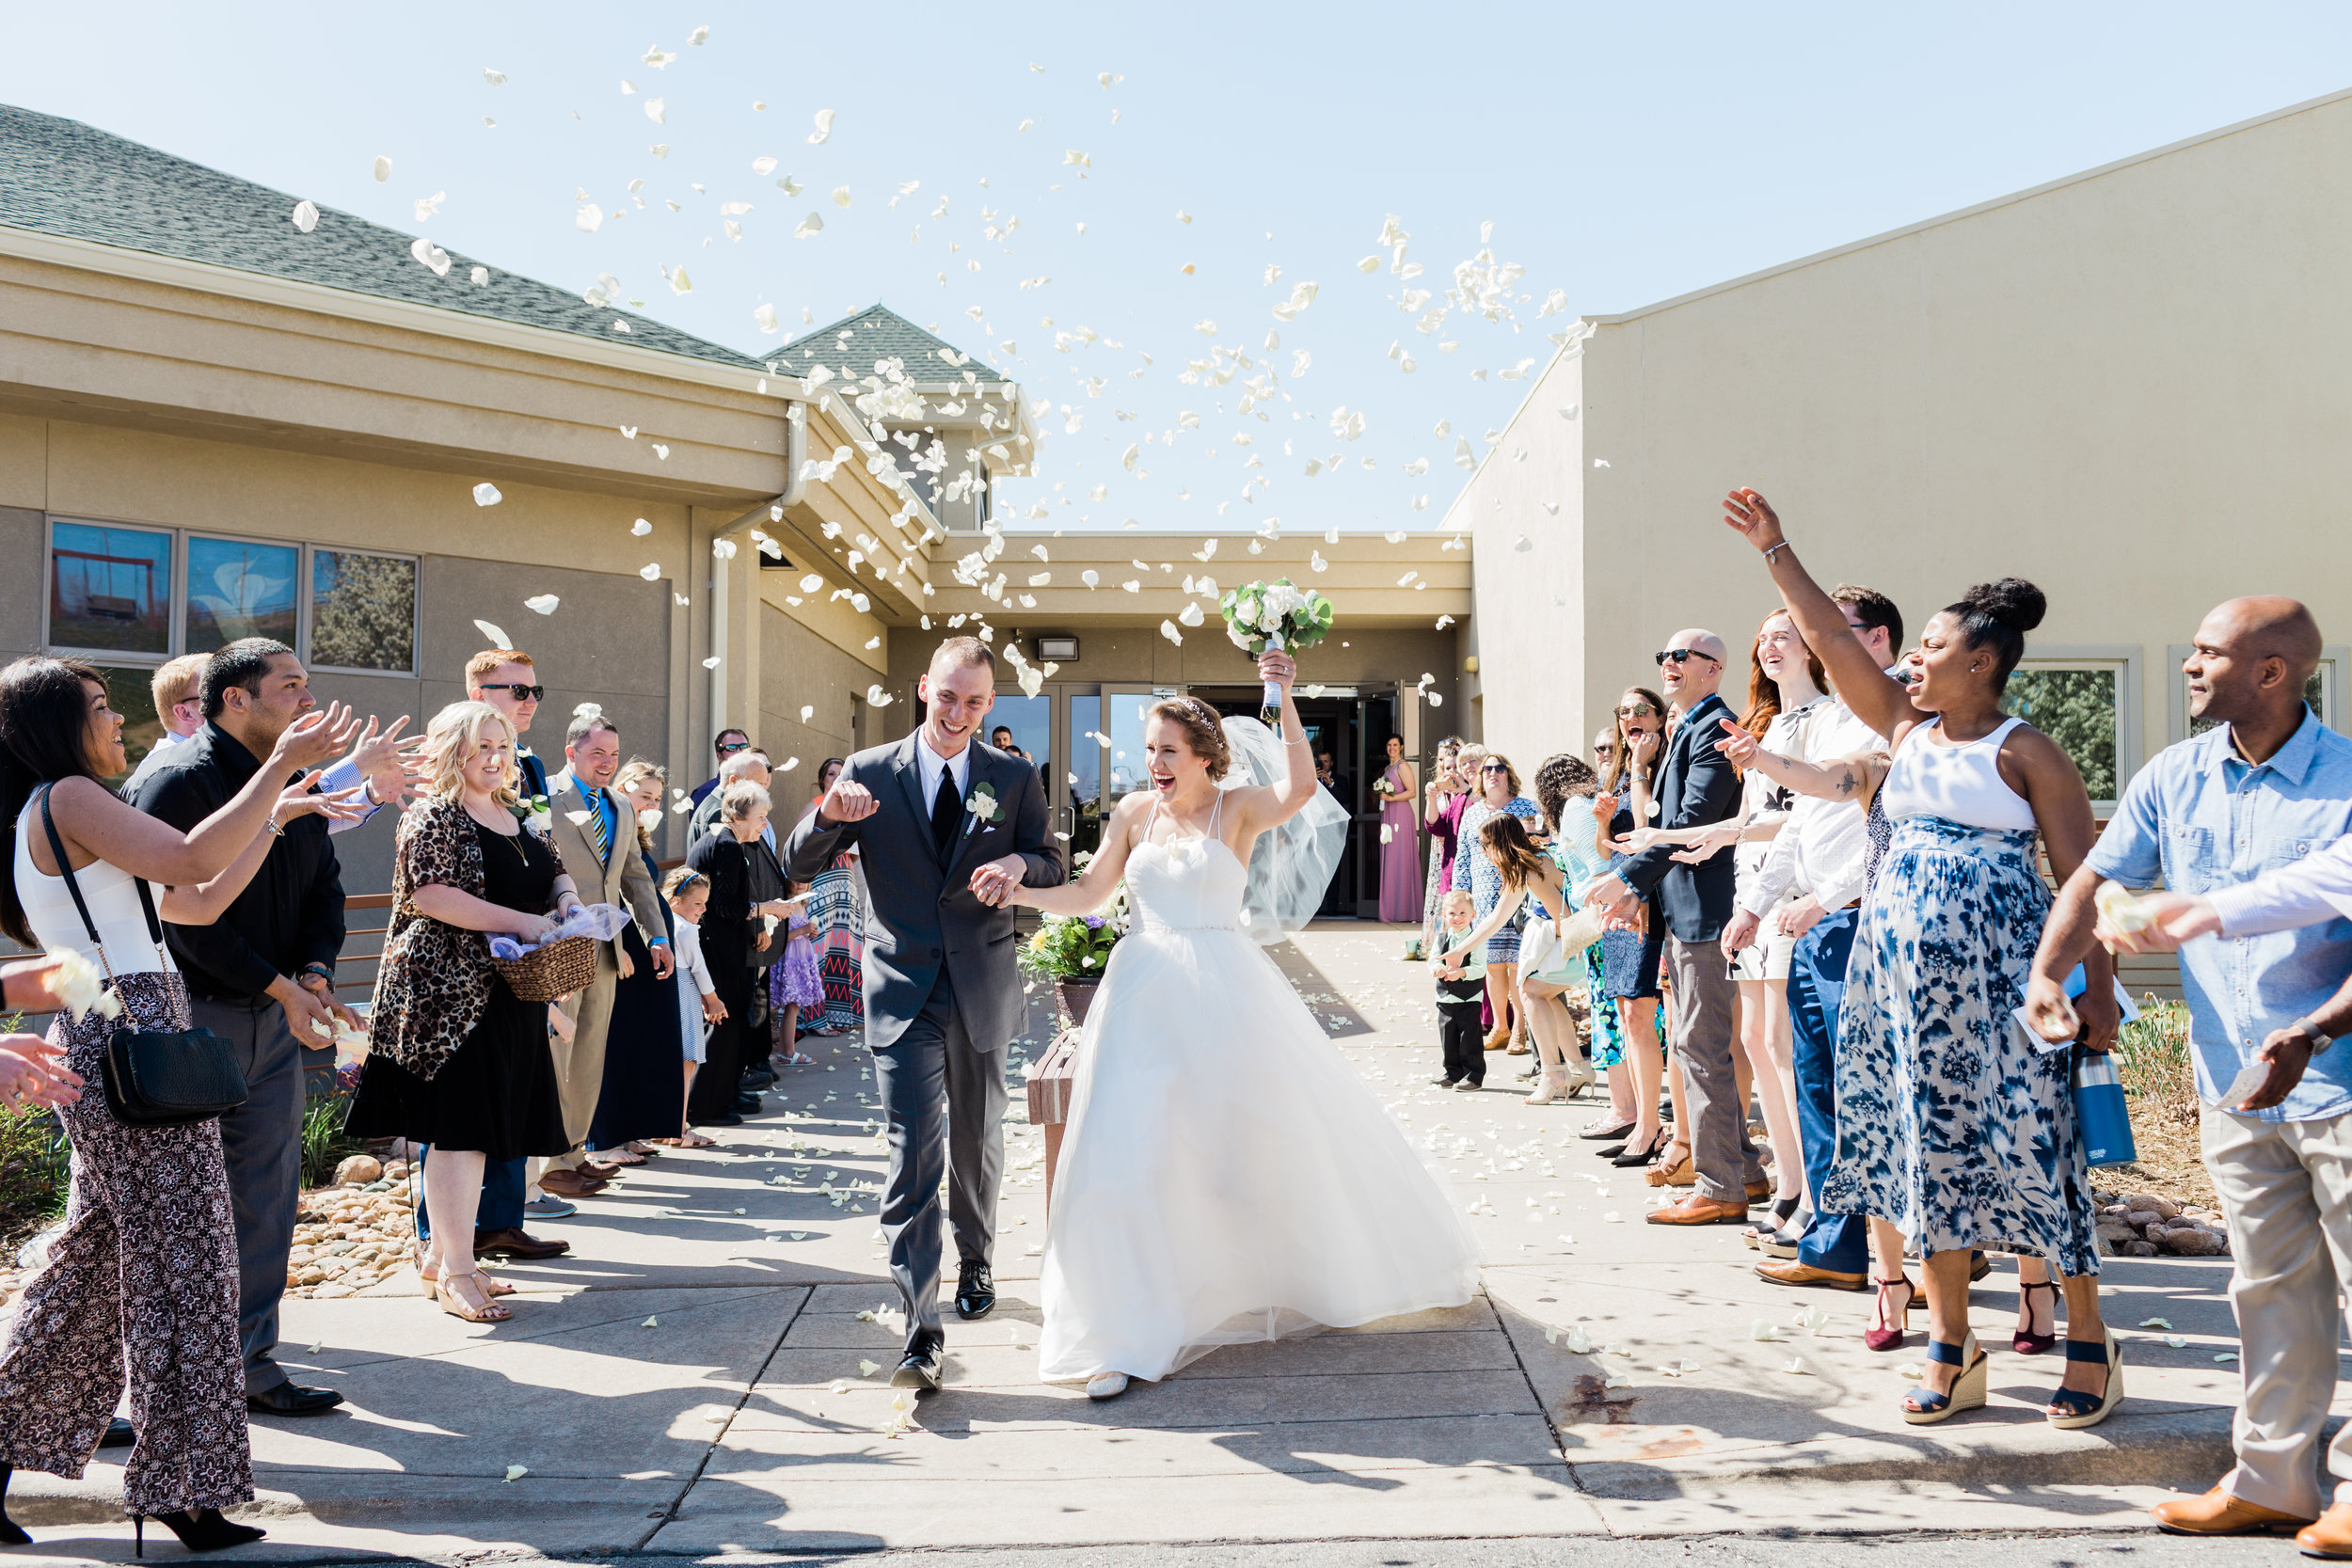 denver wedding, bride and groom, rose petals